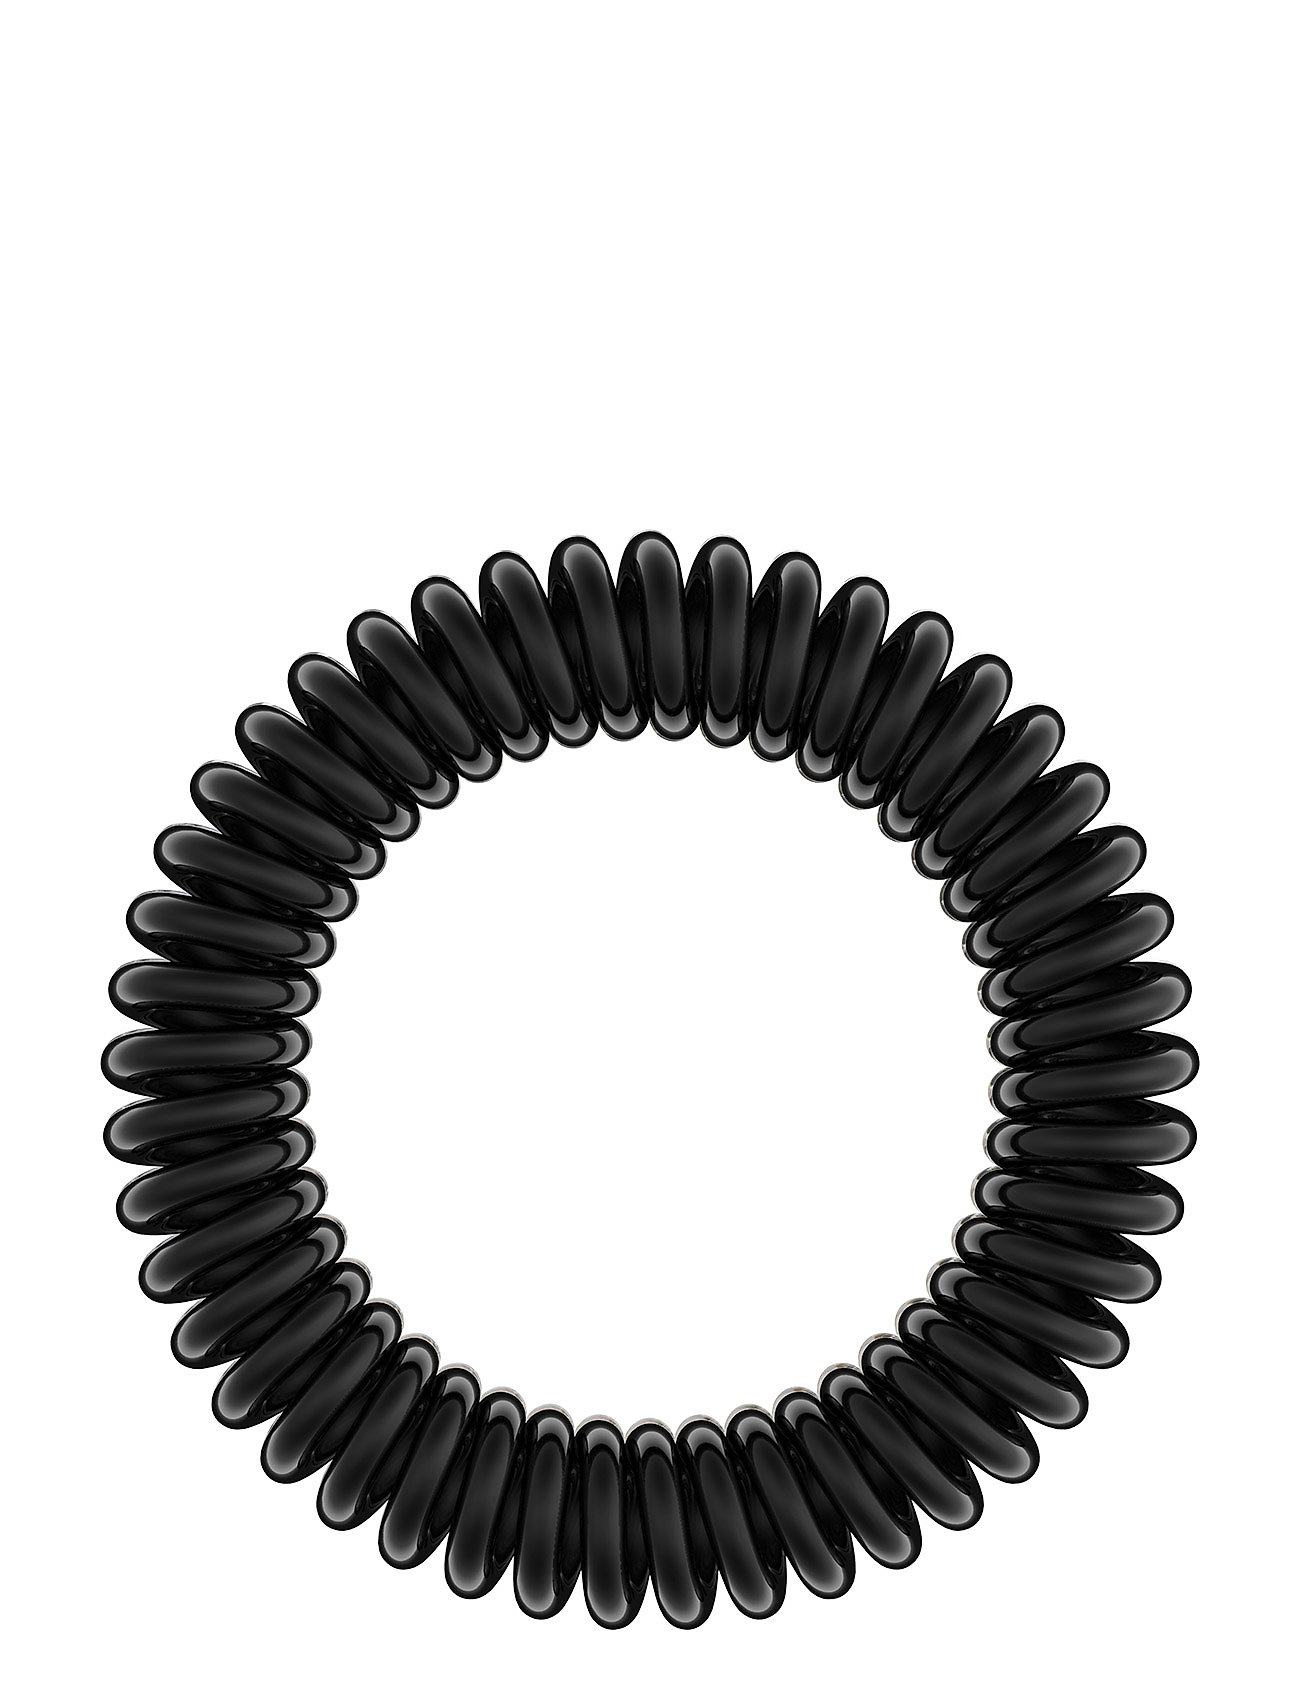 Image of Invisibobble Slim True Black Beauty WOMEN Hair Hair Accessories Sort Invisibobble (3504033267)